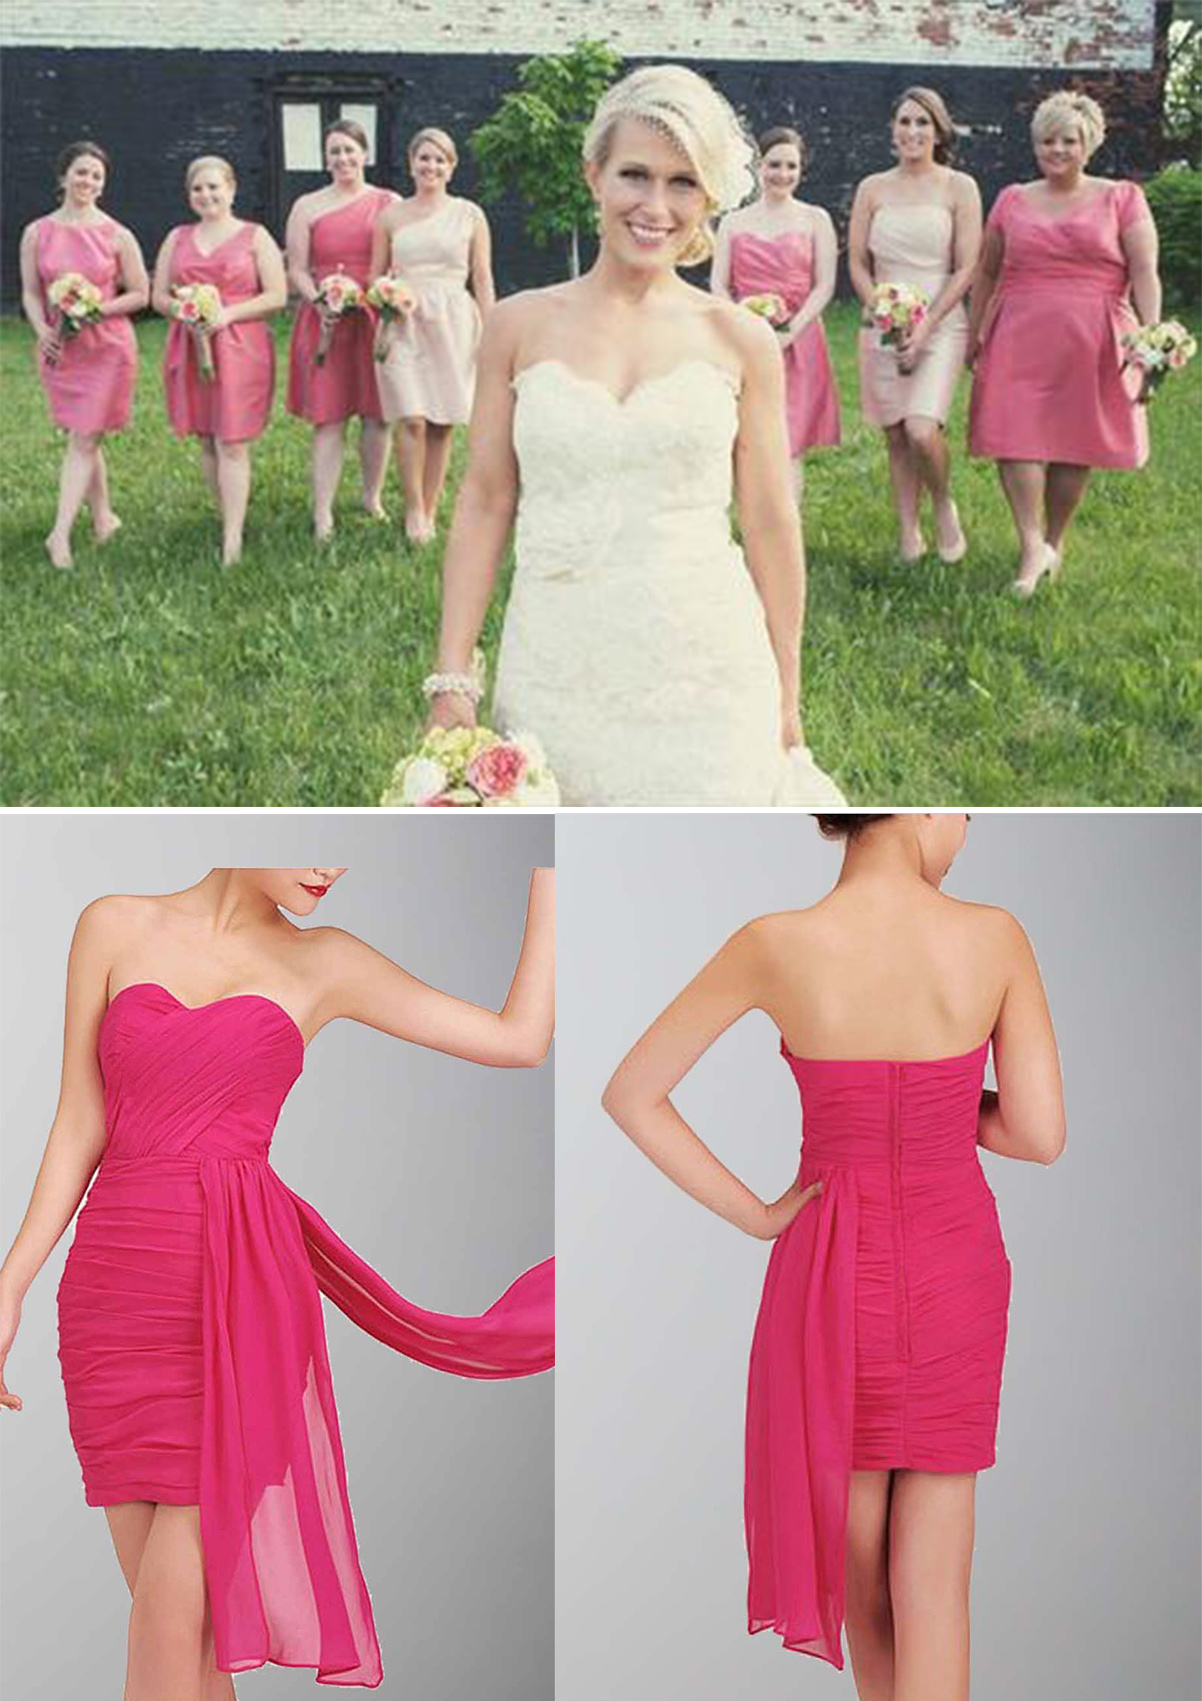 best shabby chic wedding inspirations country chic wedding dresses shabby chic rose bridesmaid dress UK